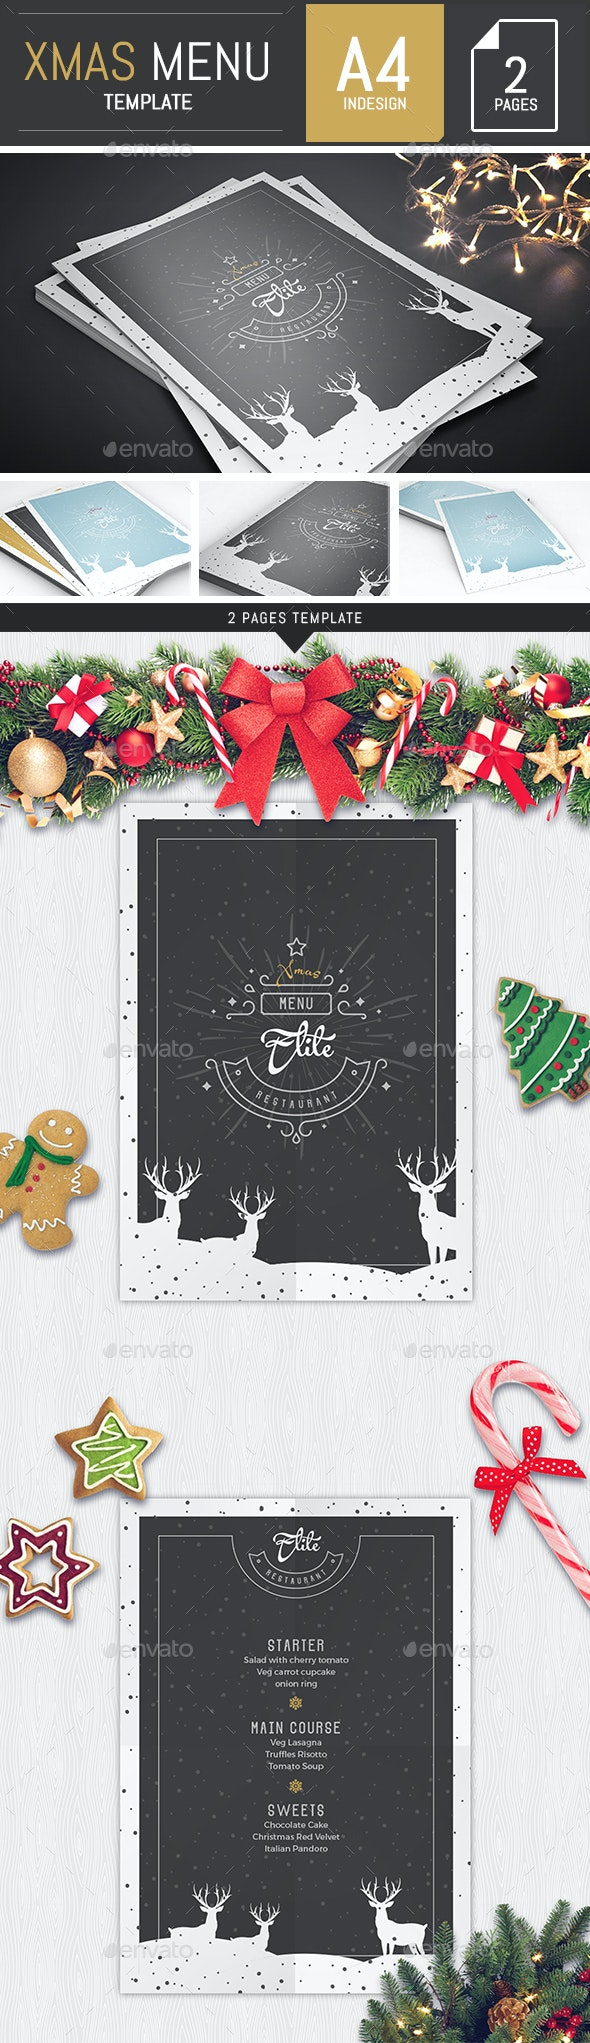 A4 Modern Christmas Menu Template - Food Menus Print Templates